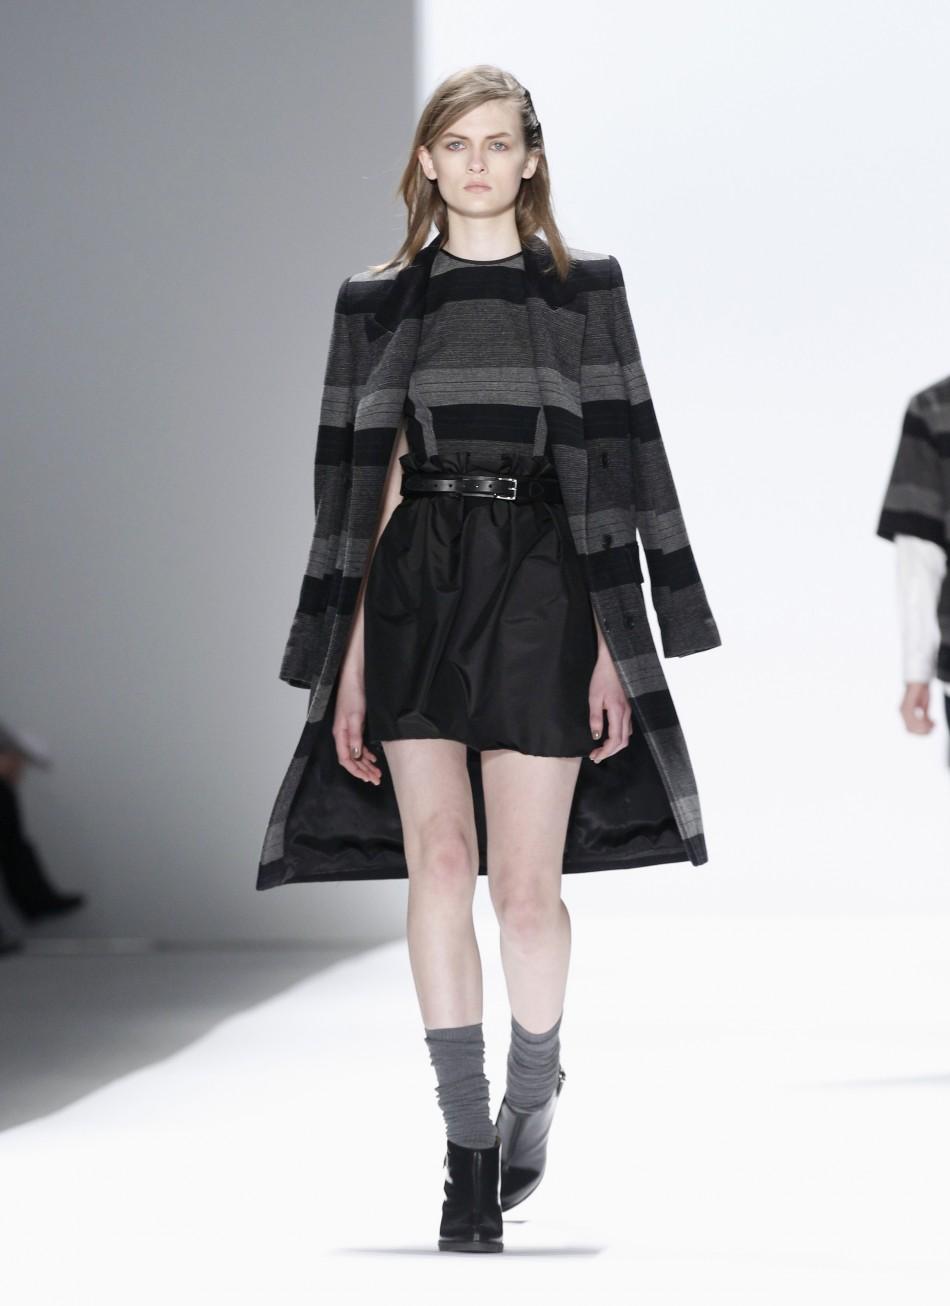 New York Fashion Week 2012- Richard Chai